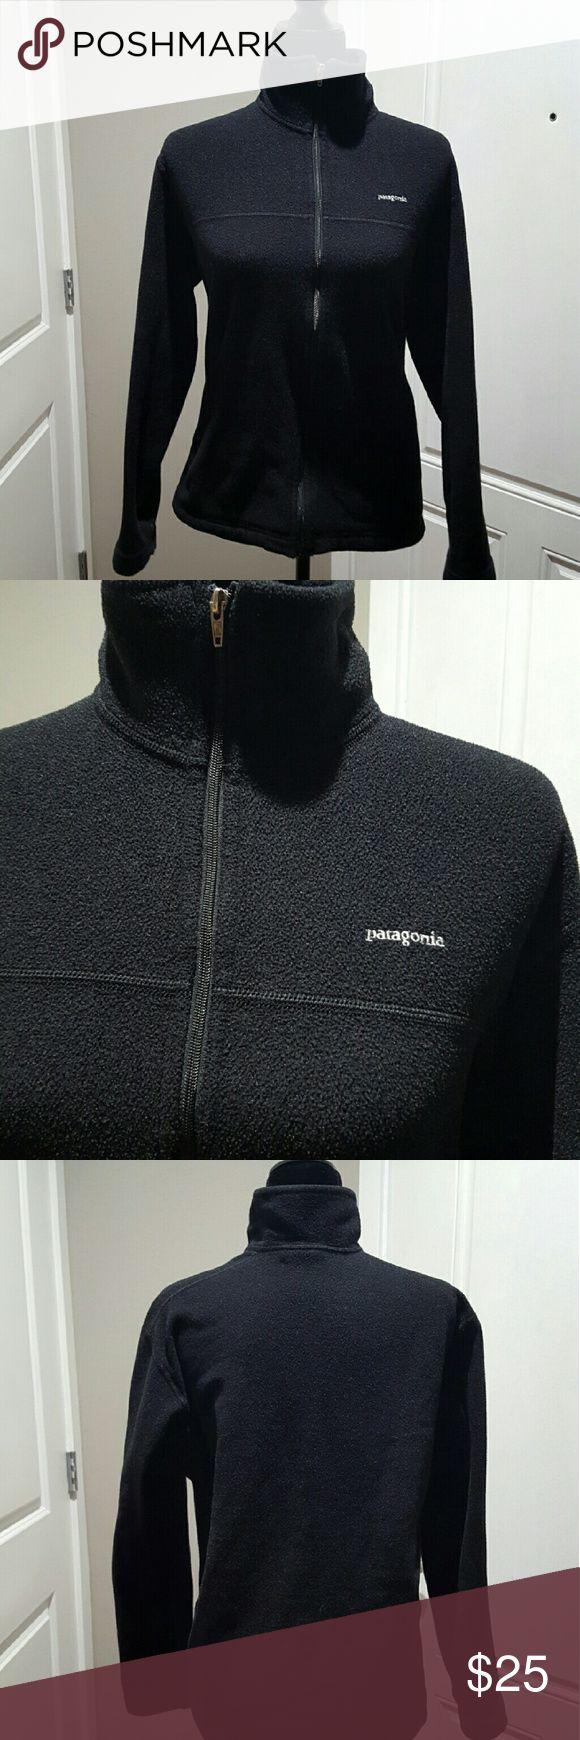 Women's black Patagonia fleece jacket, medium Women's black Patagonia fleece jacket. Light weight and warm. Size medium.  No stains or tares. Patagonia Tops Sweatshirts & Hoodies